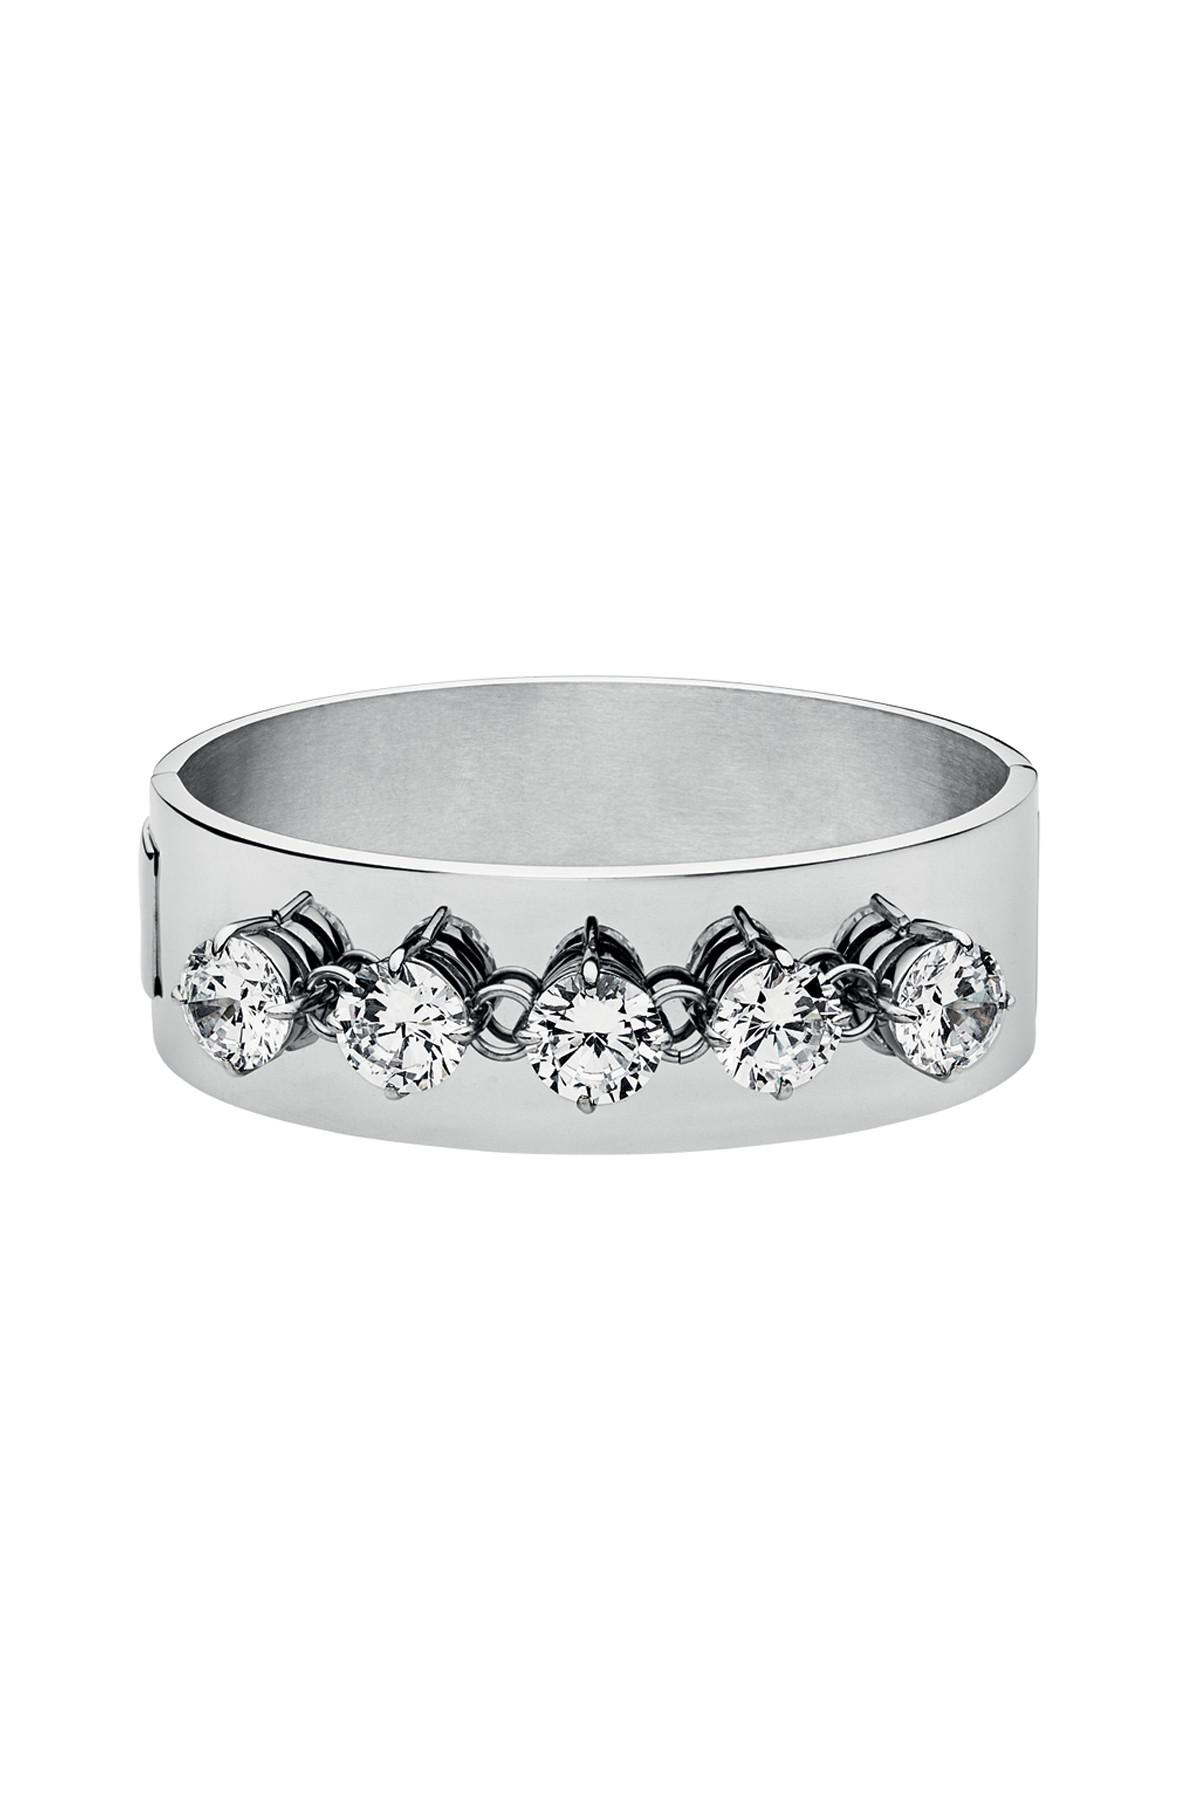 Image of   DYRBERG/KERN OPATRA/B ARMBÅND 335212 (Silver, Crystal, ONESIZE)